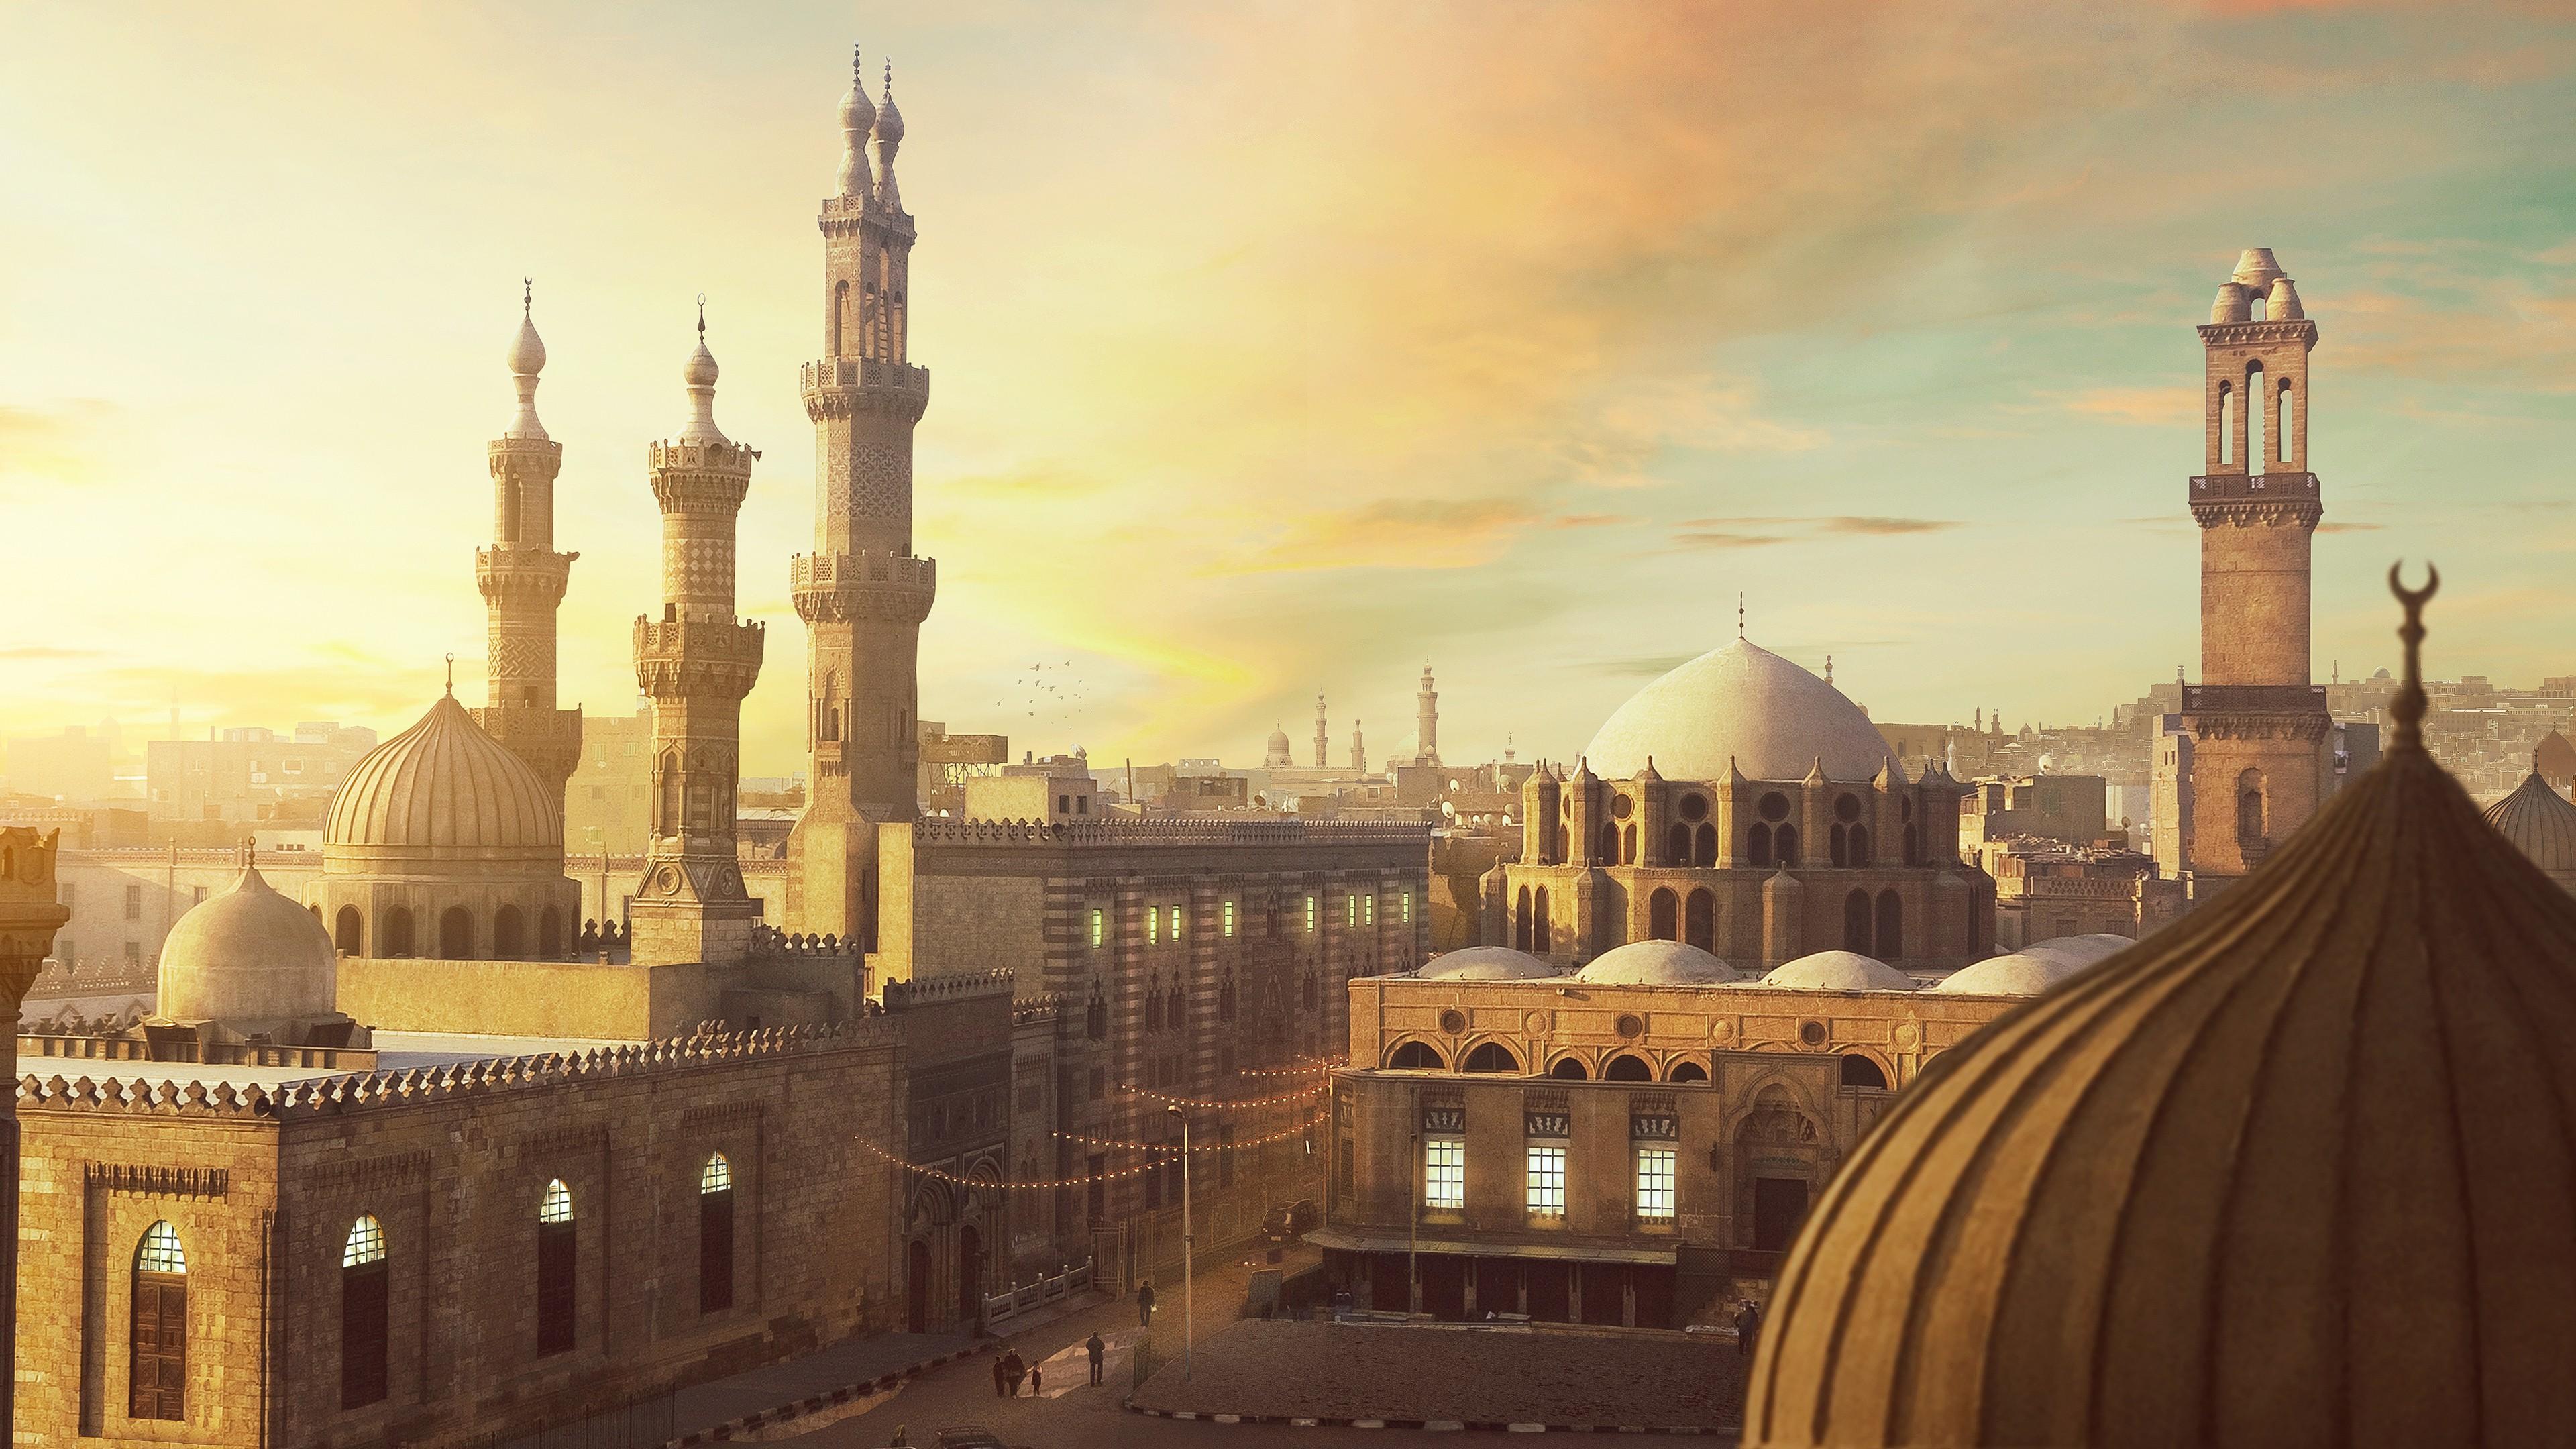 3d Masjid Wallpapers Egypt Ramadan 4k Wallpapers Hd Wallpapers Id 22470